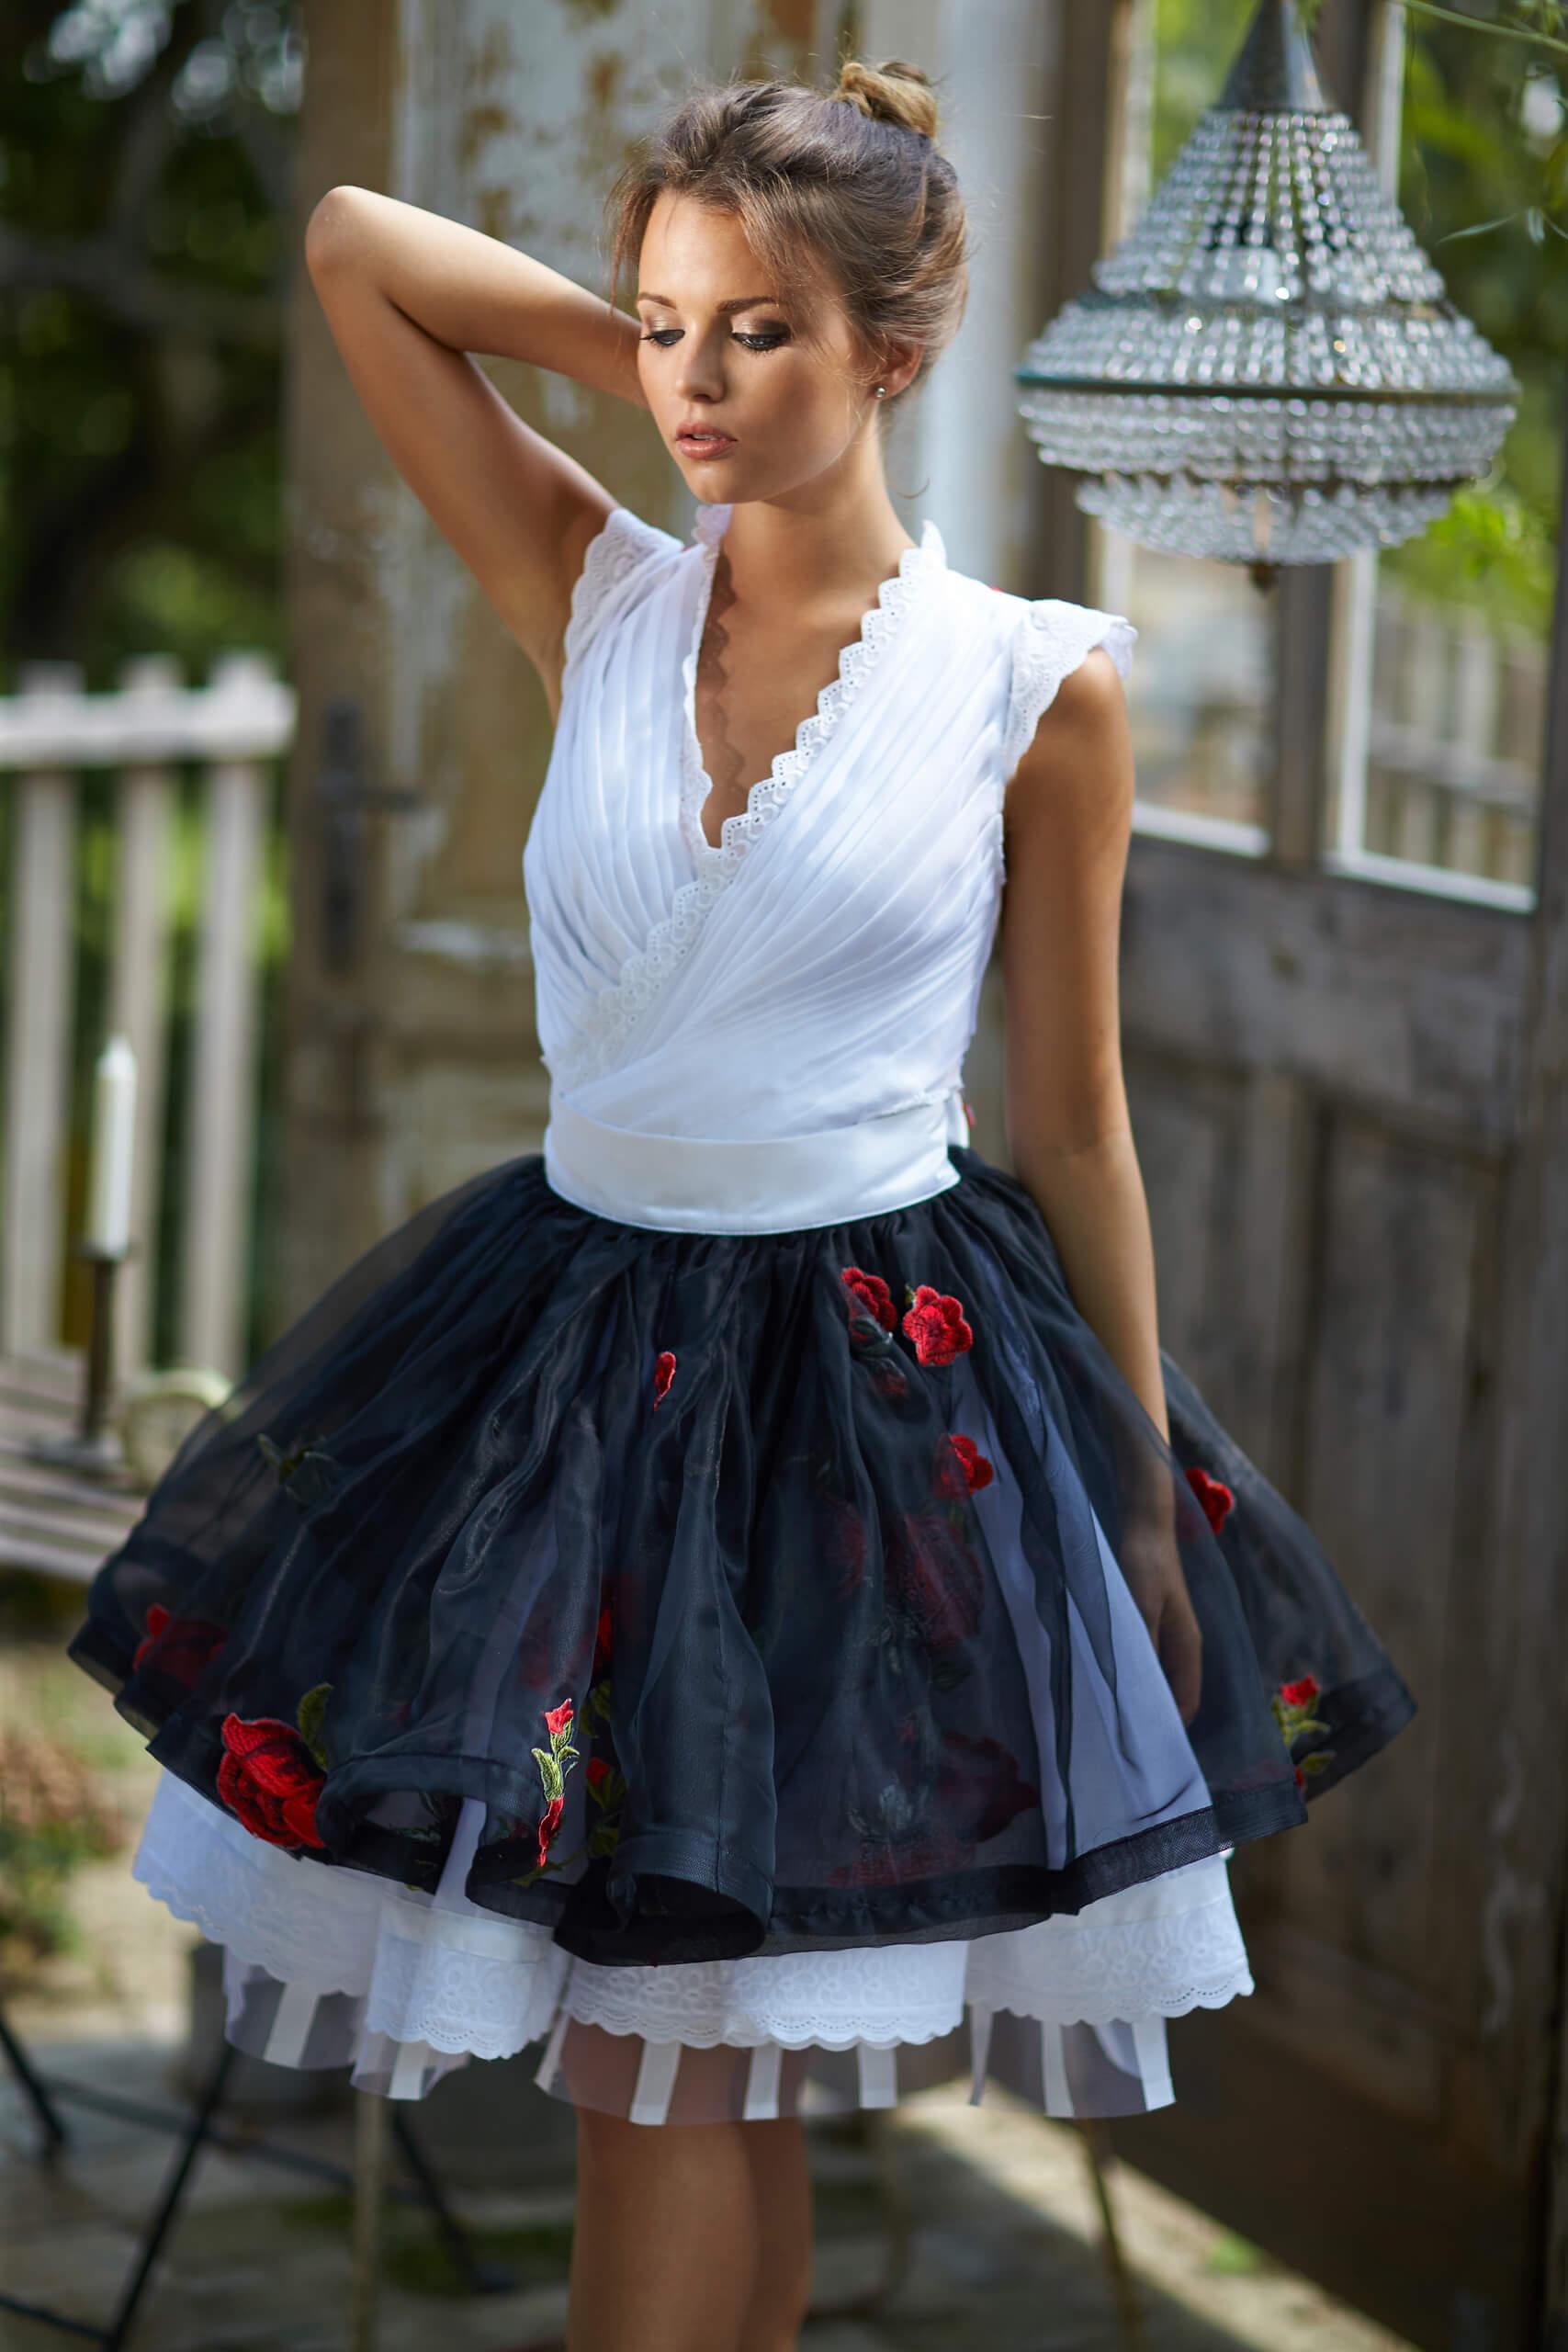 b14922d616 2019 Bélavári Zita Couture. Wedding & Casual Fashion. 0 ...